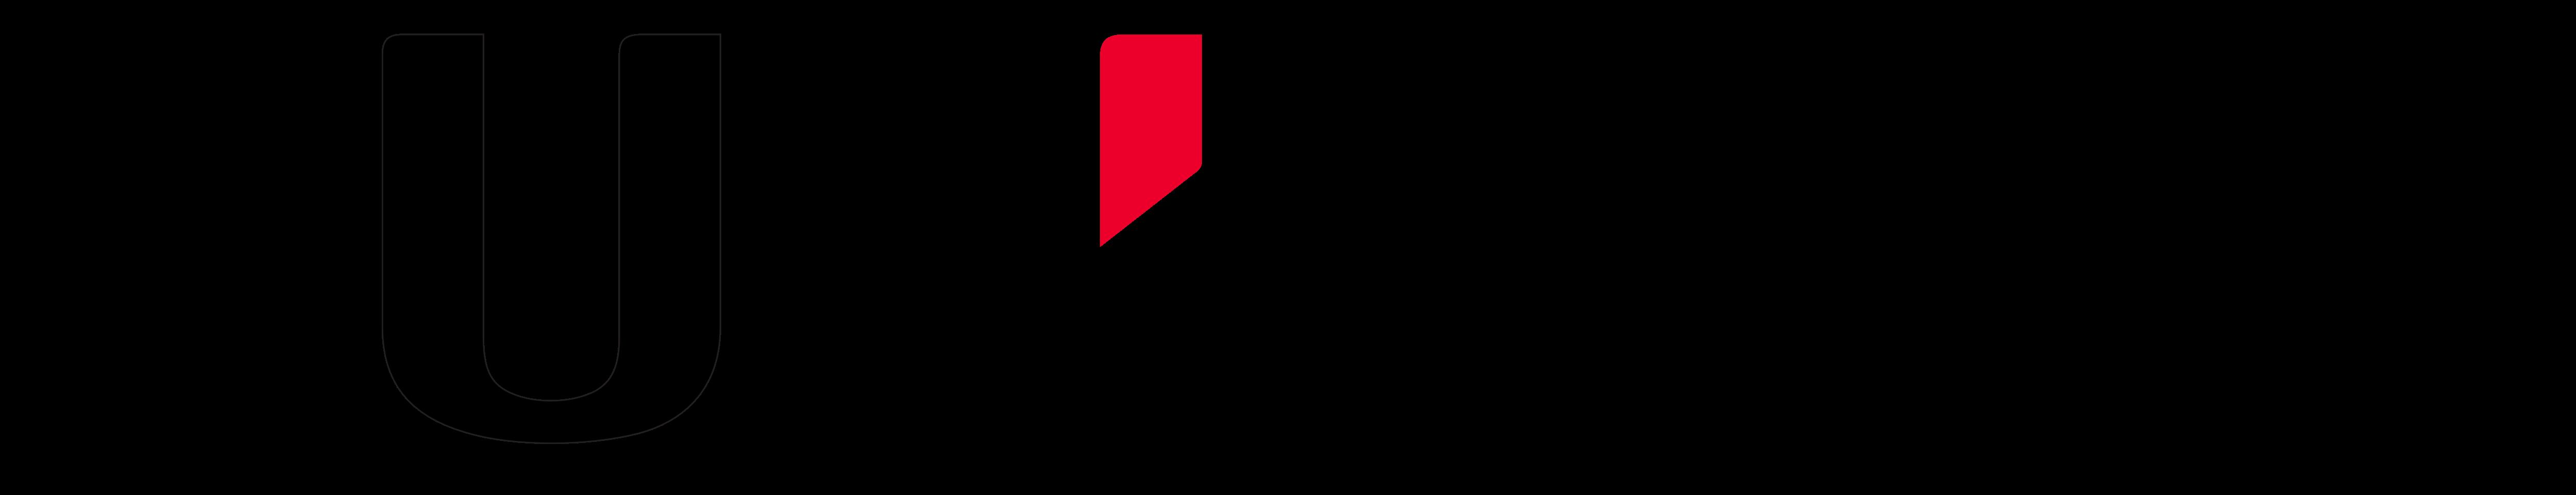 Fujifilm-Logo-PA-FORMATION